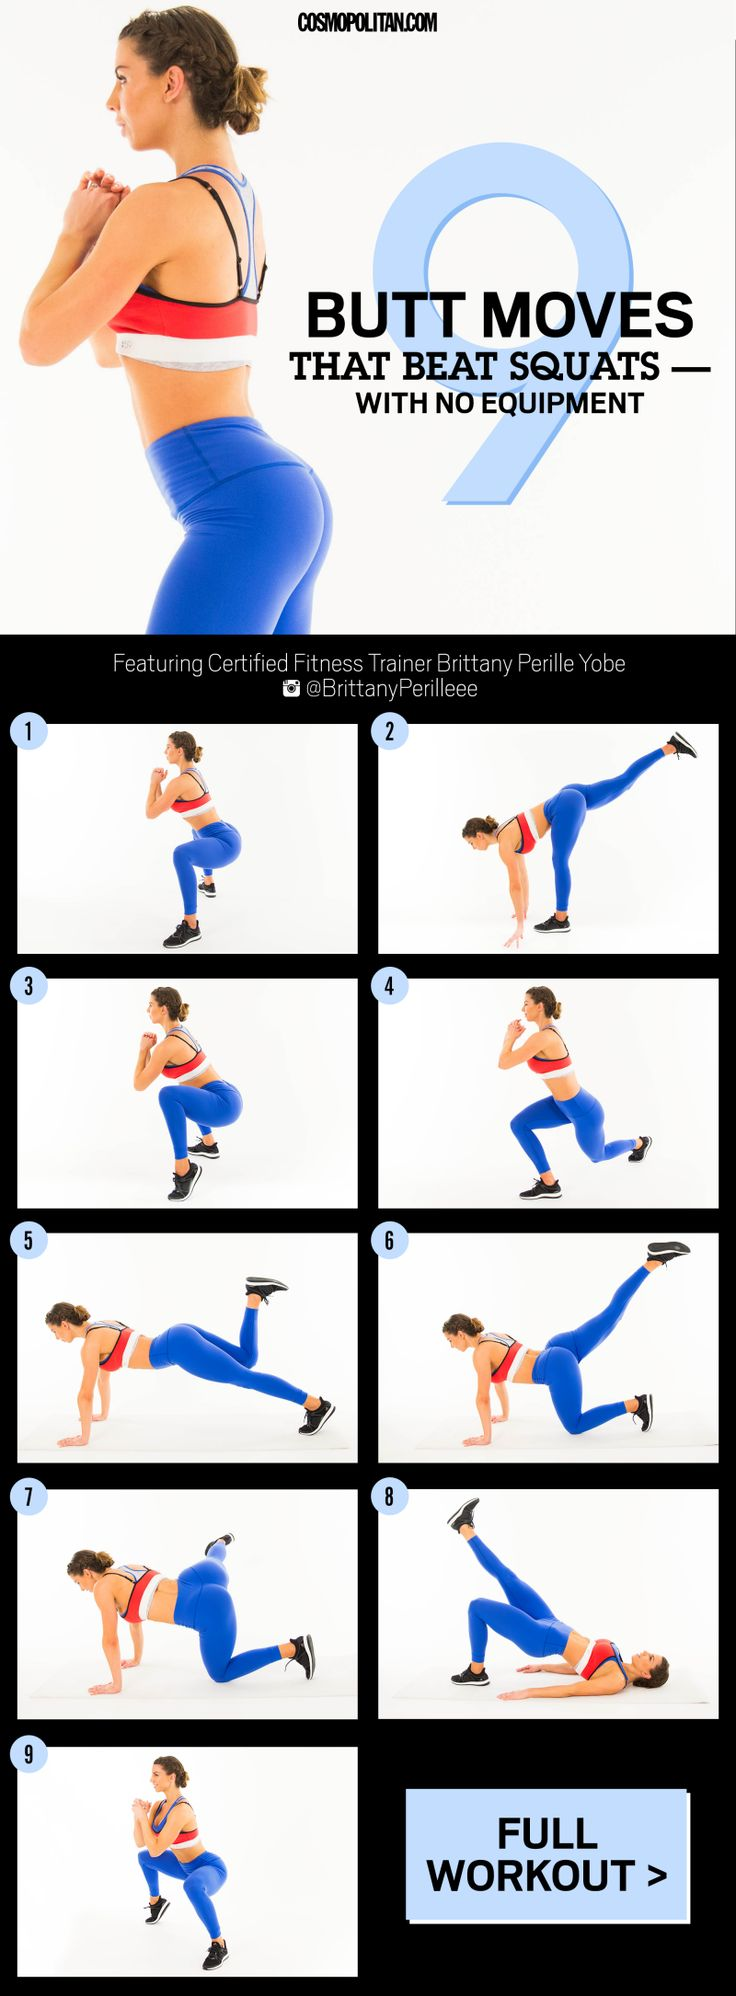 #kamphausen #nonboring #exercises #kathleen #squats